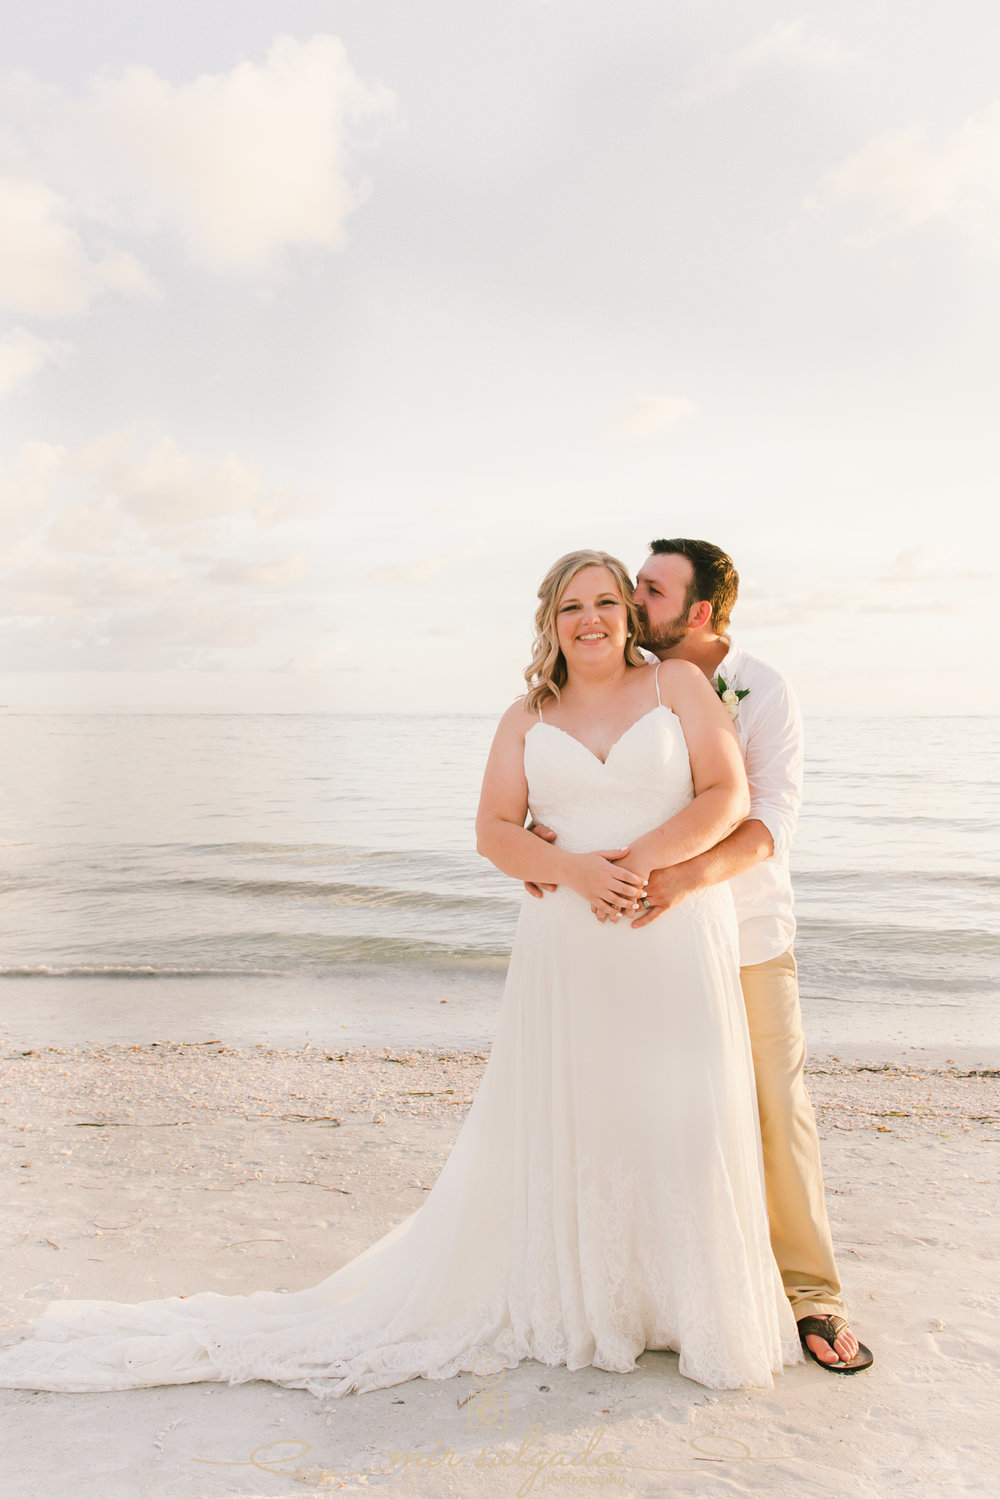 Tide-the-knot-beach-weddings, bride-and-groom-beach-wedding-photo